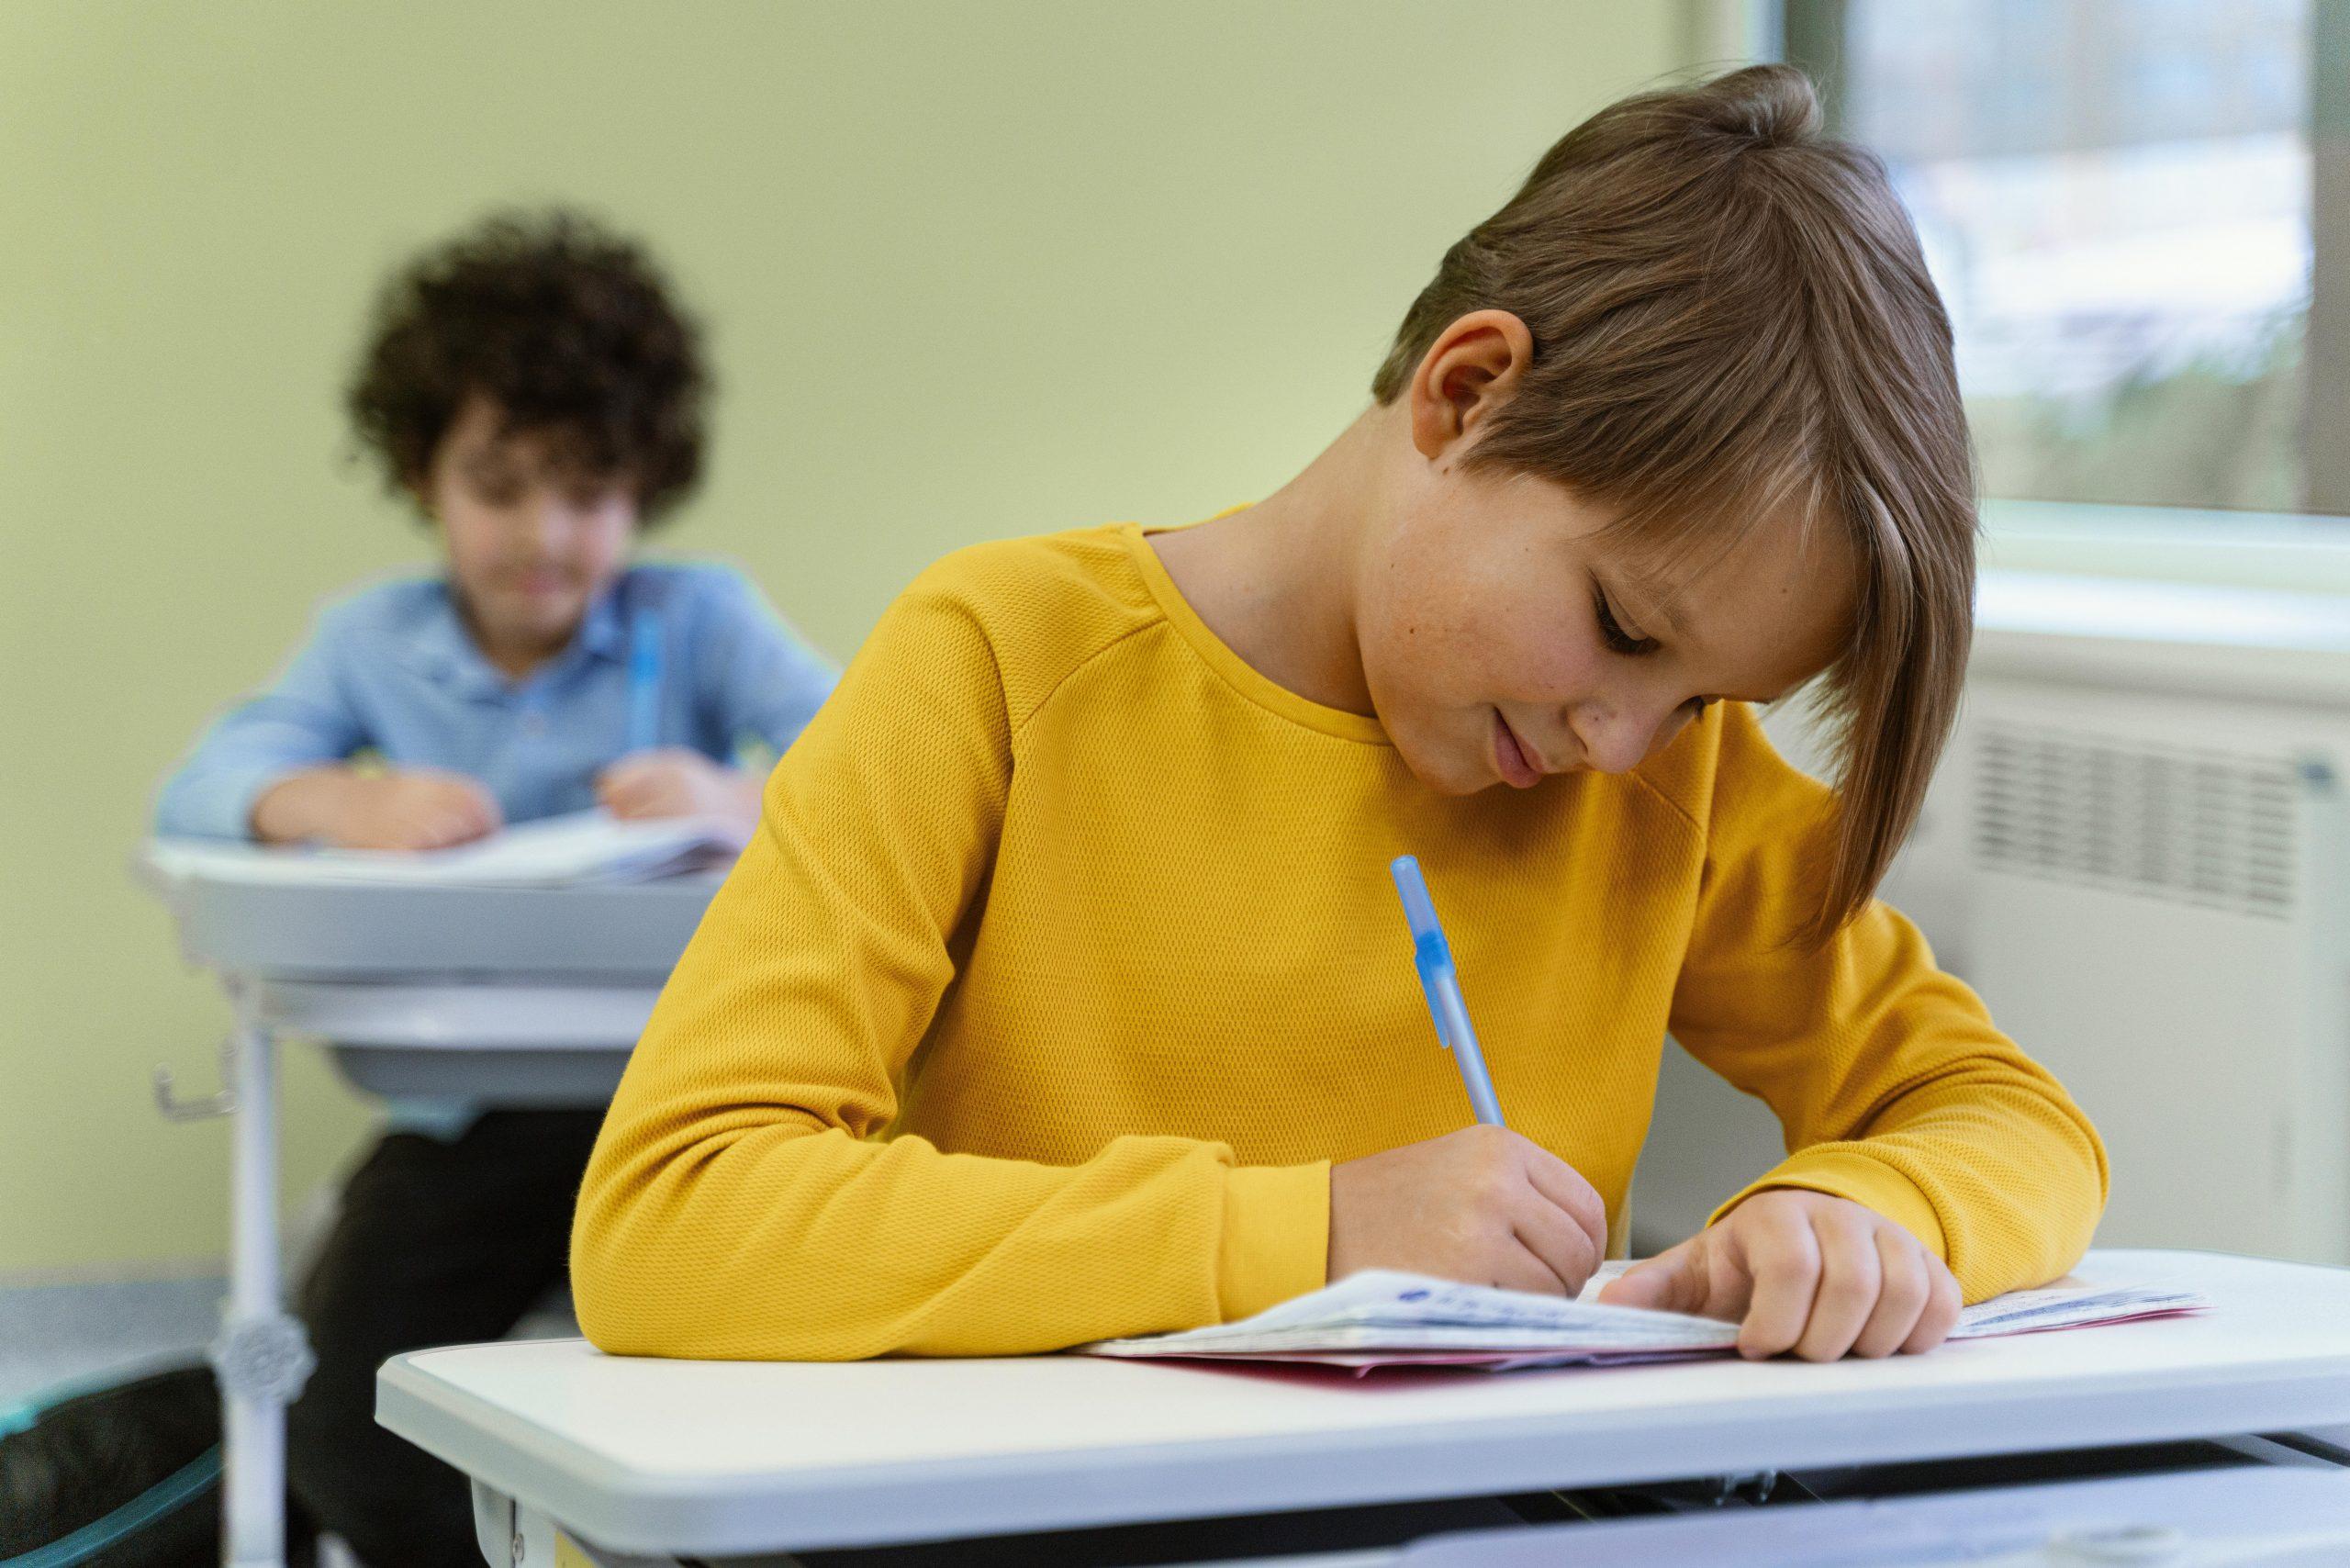 front-view-children-class-school